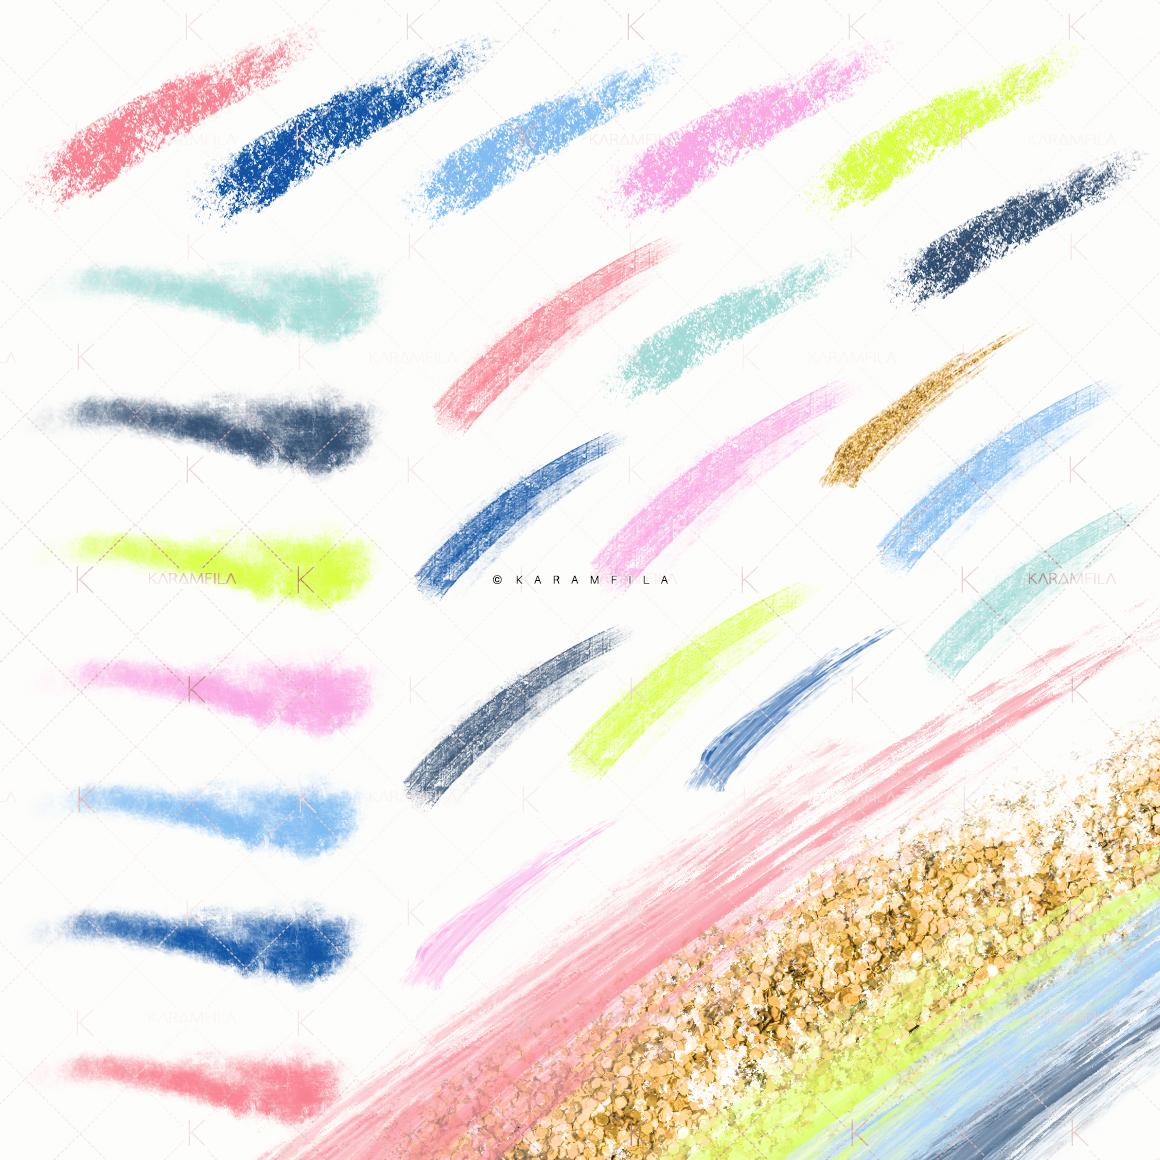 Neon Brush Stroke Clipart example image 2